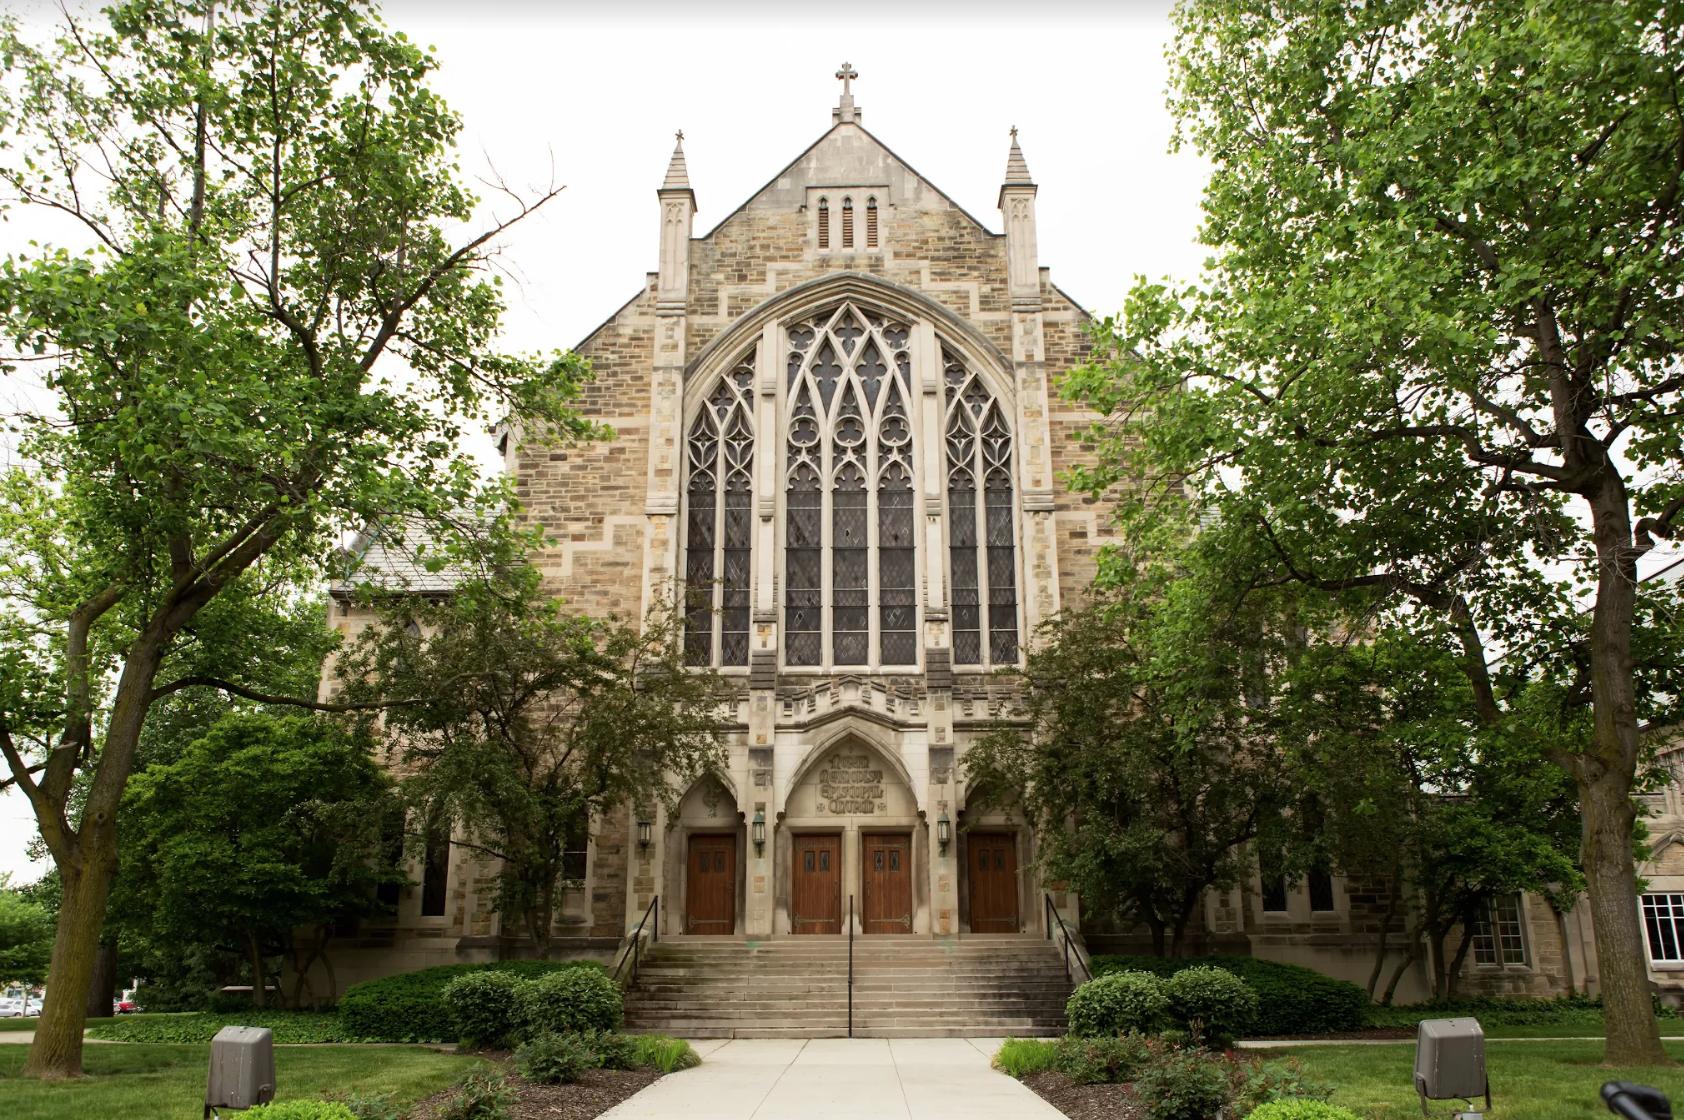 Anne's church, North UMC / Carmen Daughtery Photography